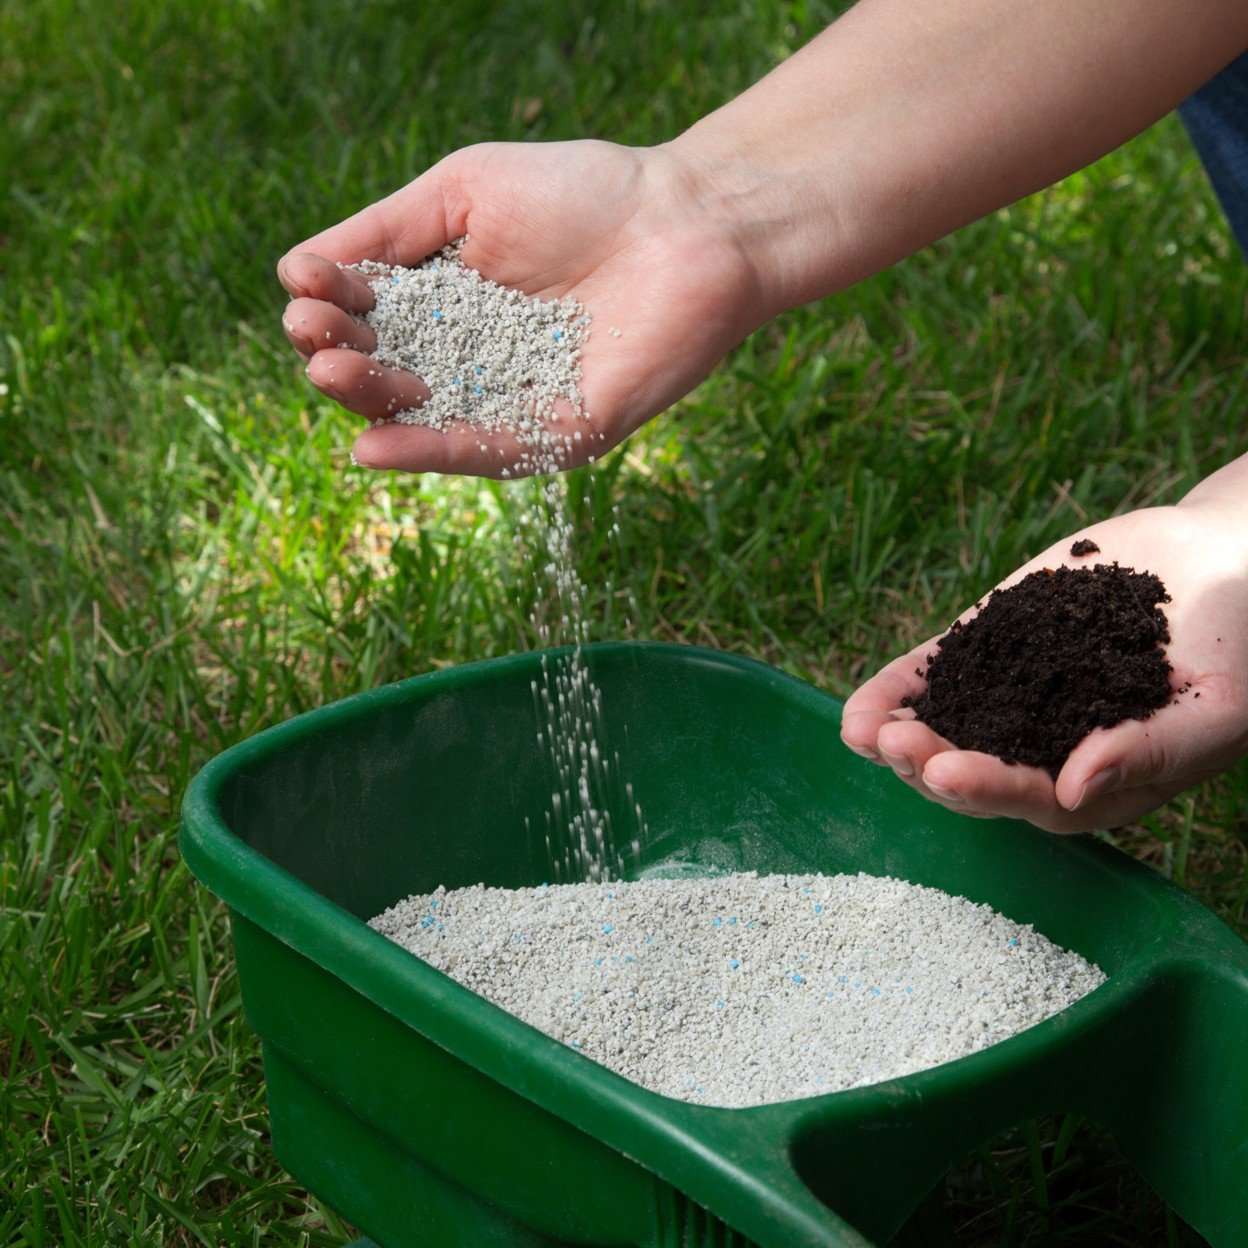 Fertilizer and IPM